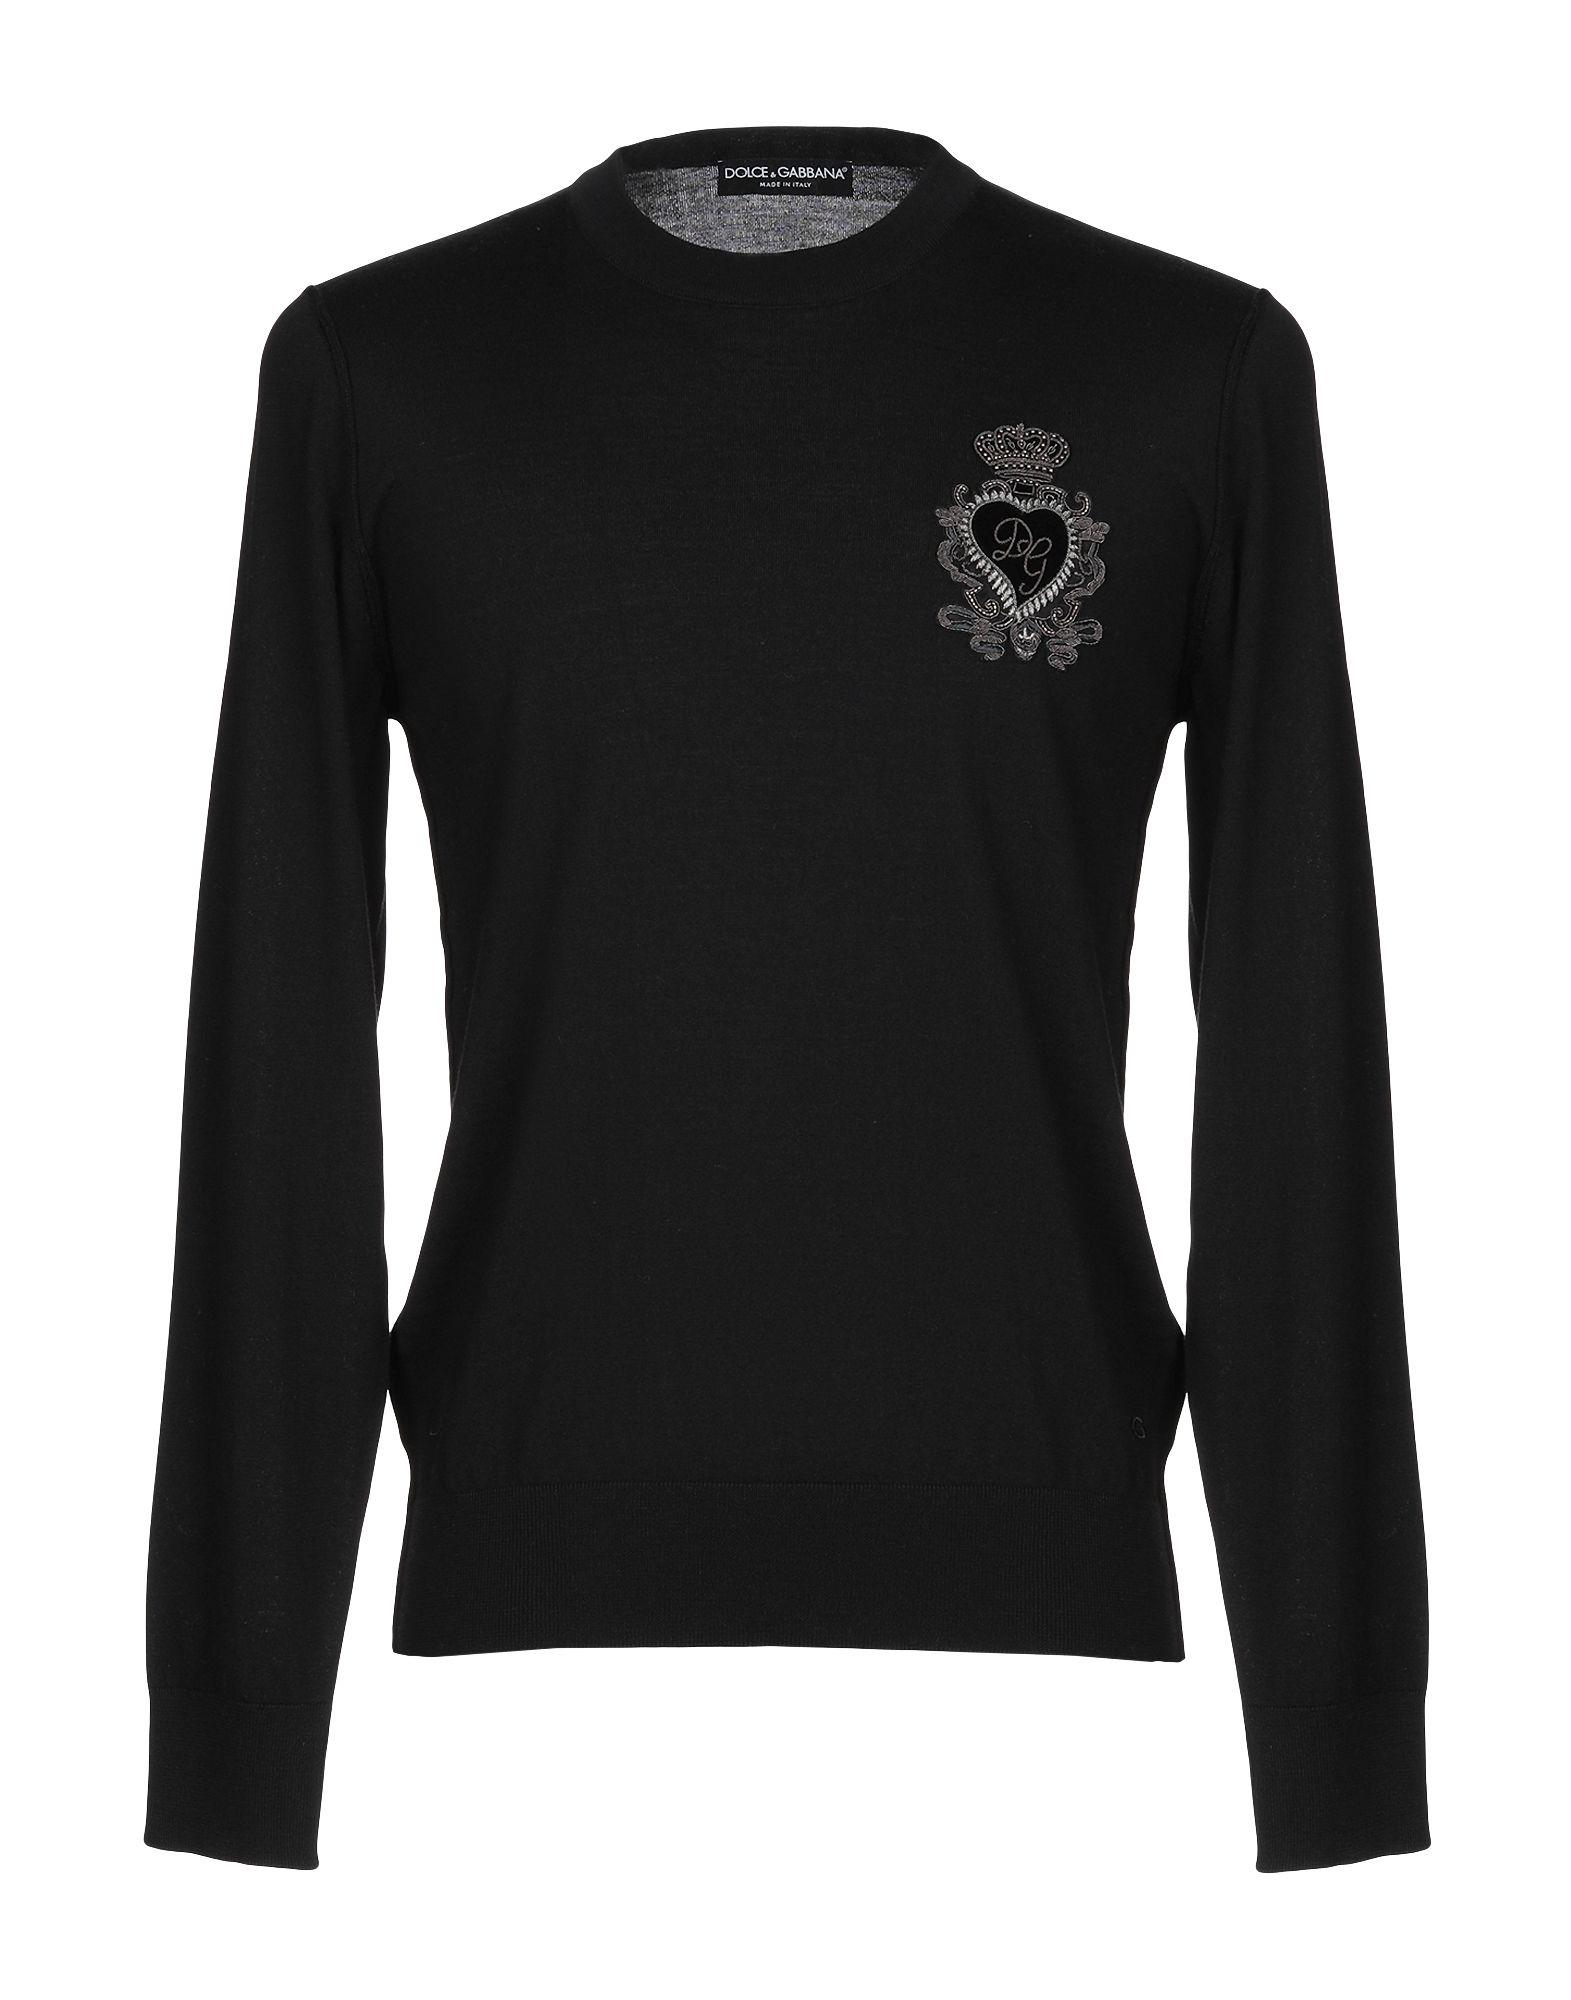 DOLCE & GABBANA Sweaters - Item 39959333